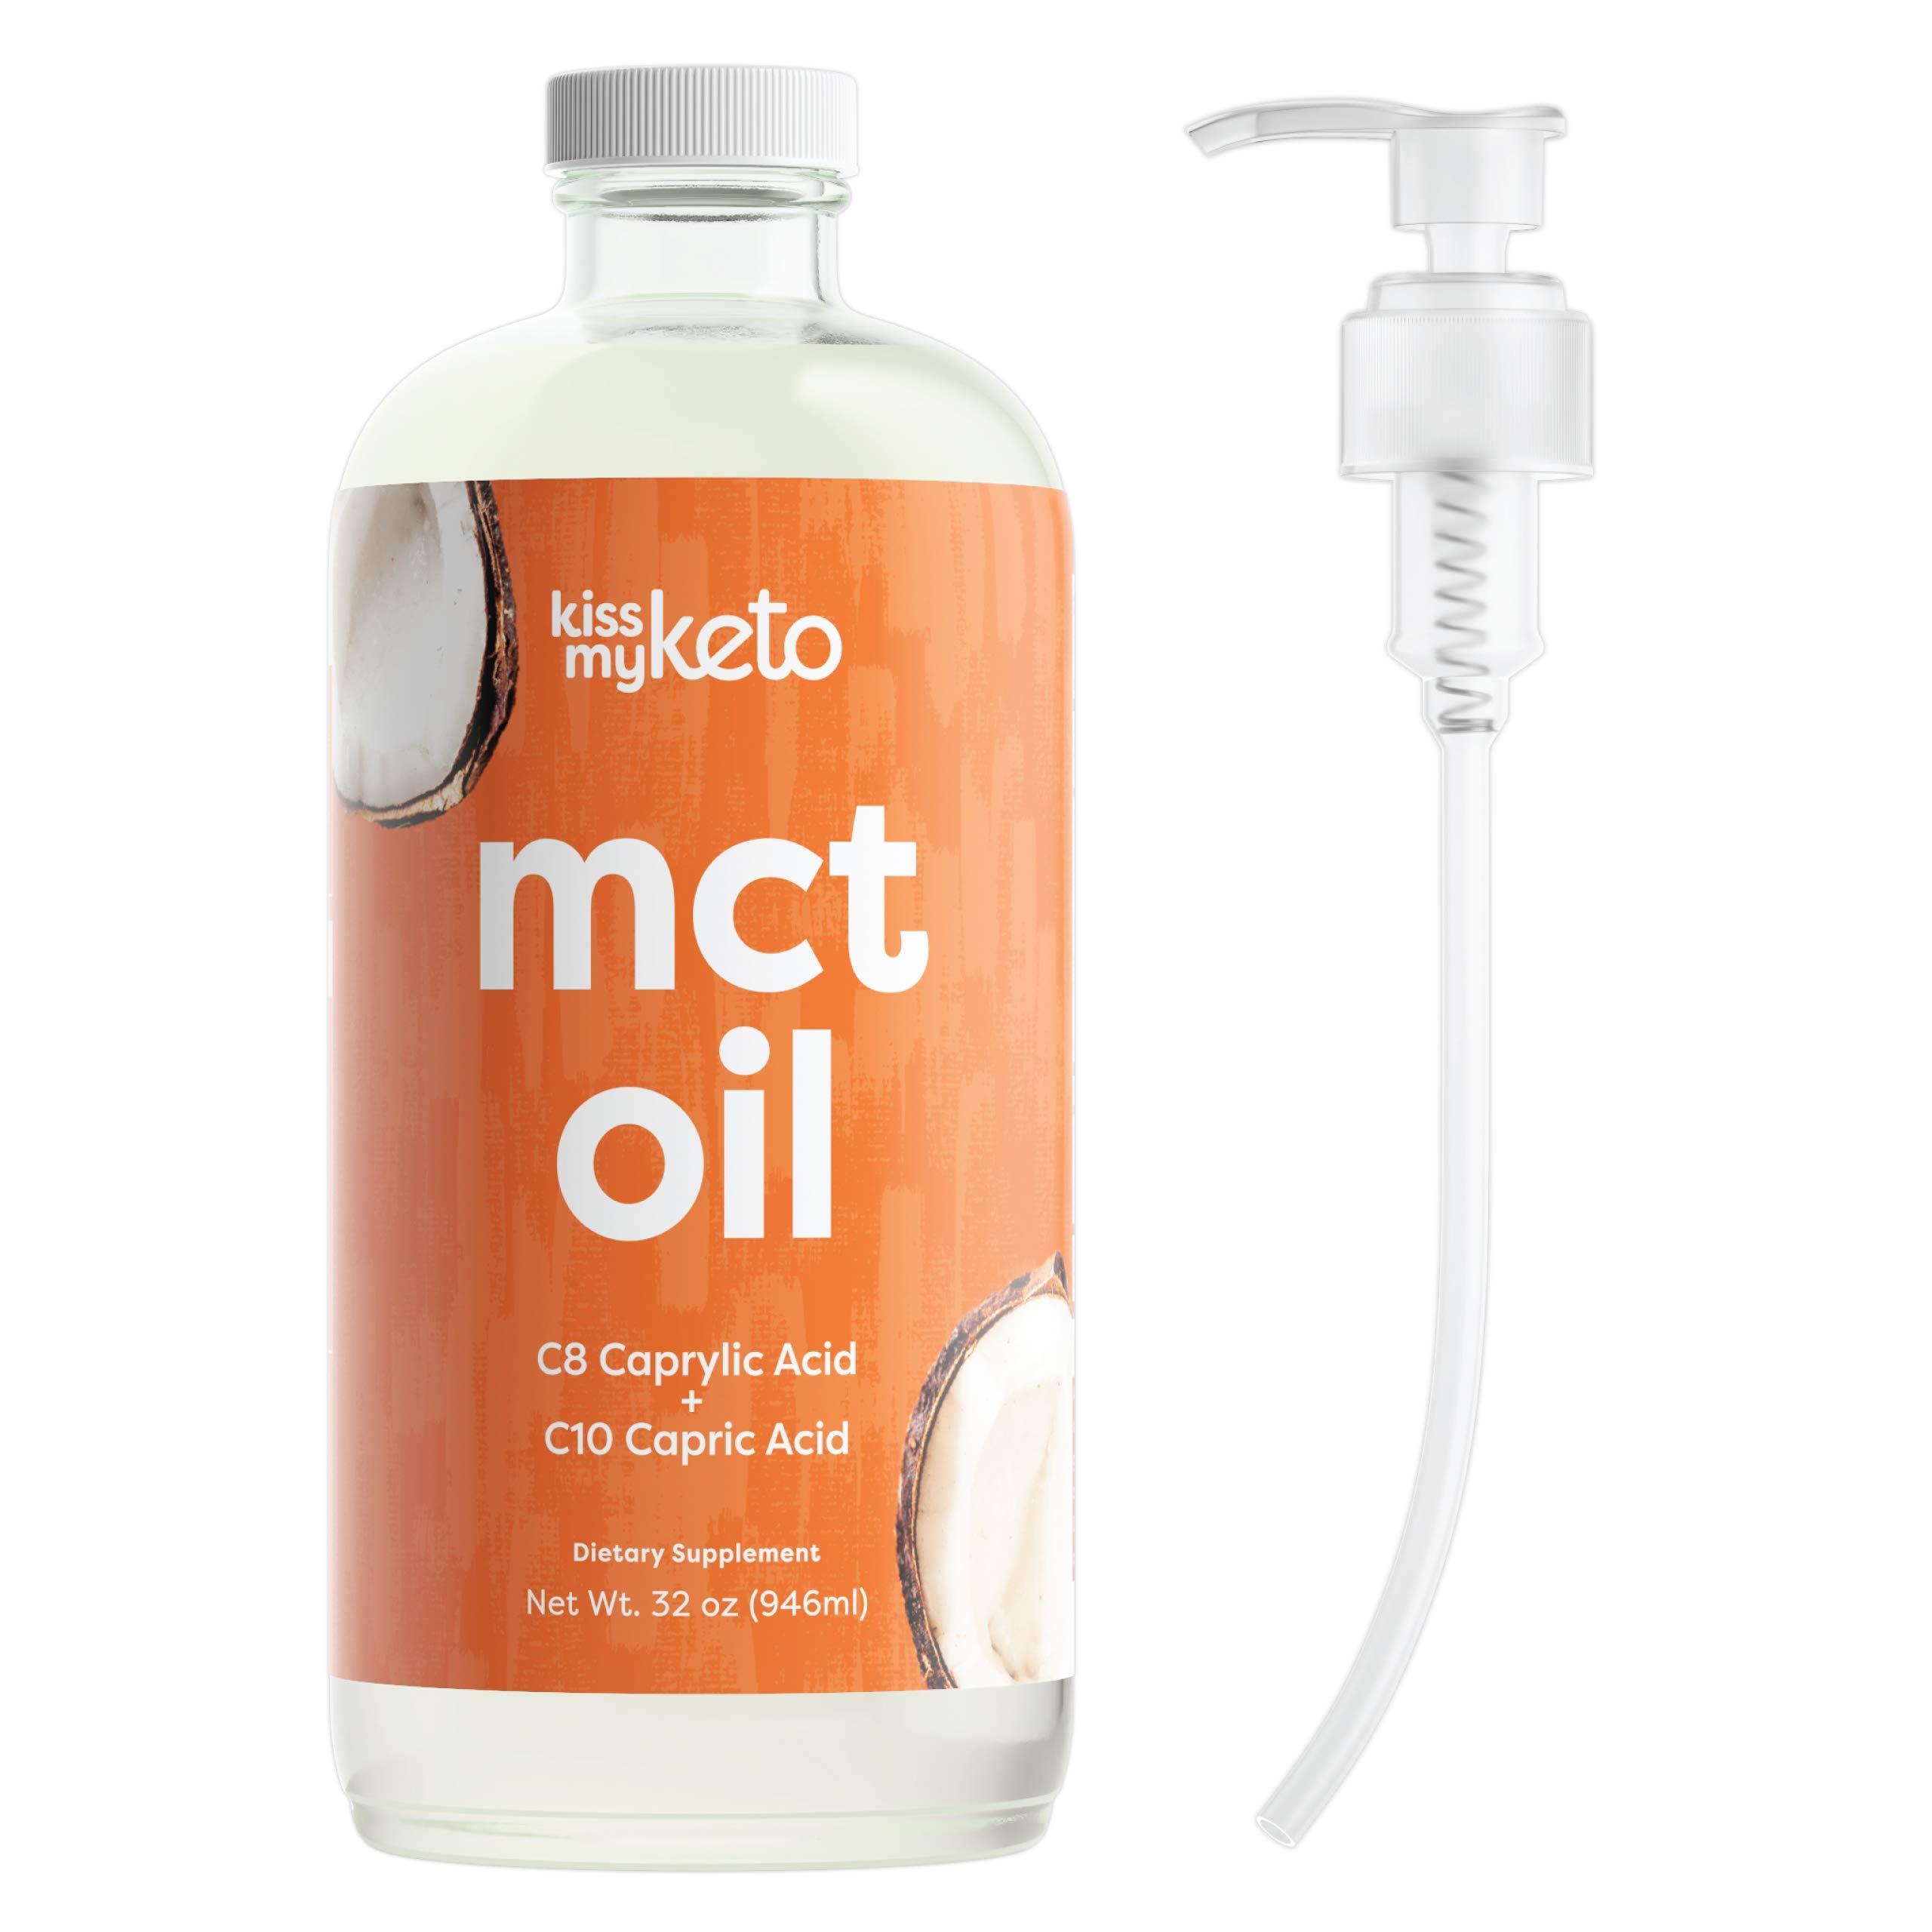 Kiss My Keto MCT Oil 32 oz — Premium MCT Oil C8 & C10 + Dosing Pump   Coconut Oil Medium Chain Triglycerides from Sustainable Non-GMO Coconuts   for Keto Coffee & Tea, Salads, Keto Shakes